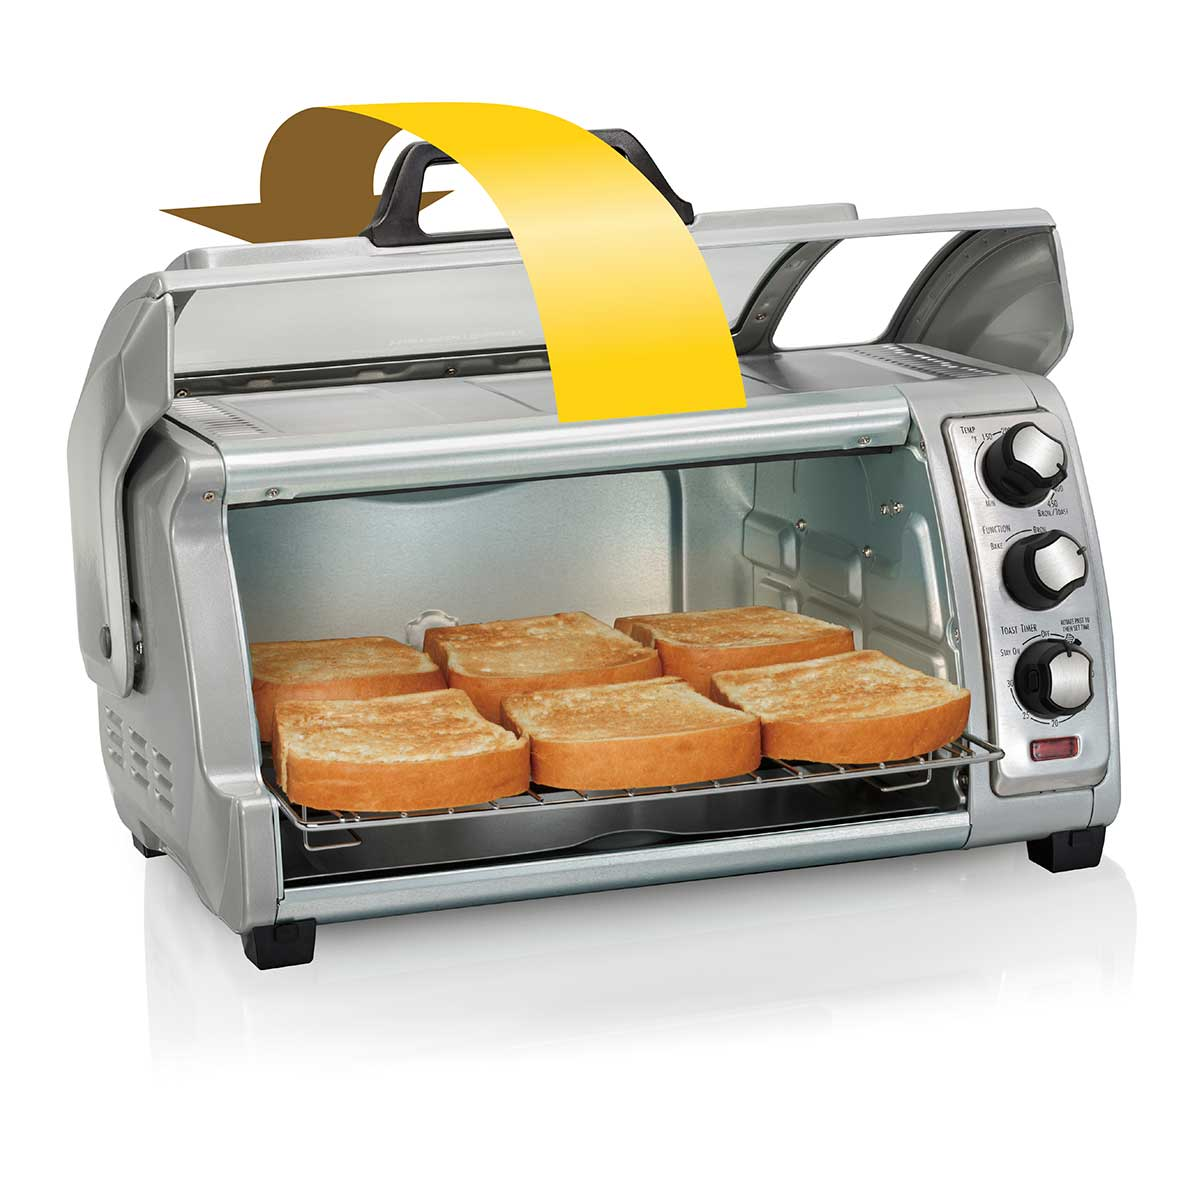 Easy Reach® Toaster Oven With Roll Top Door (31127D)